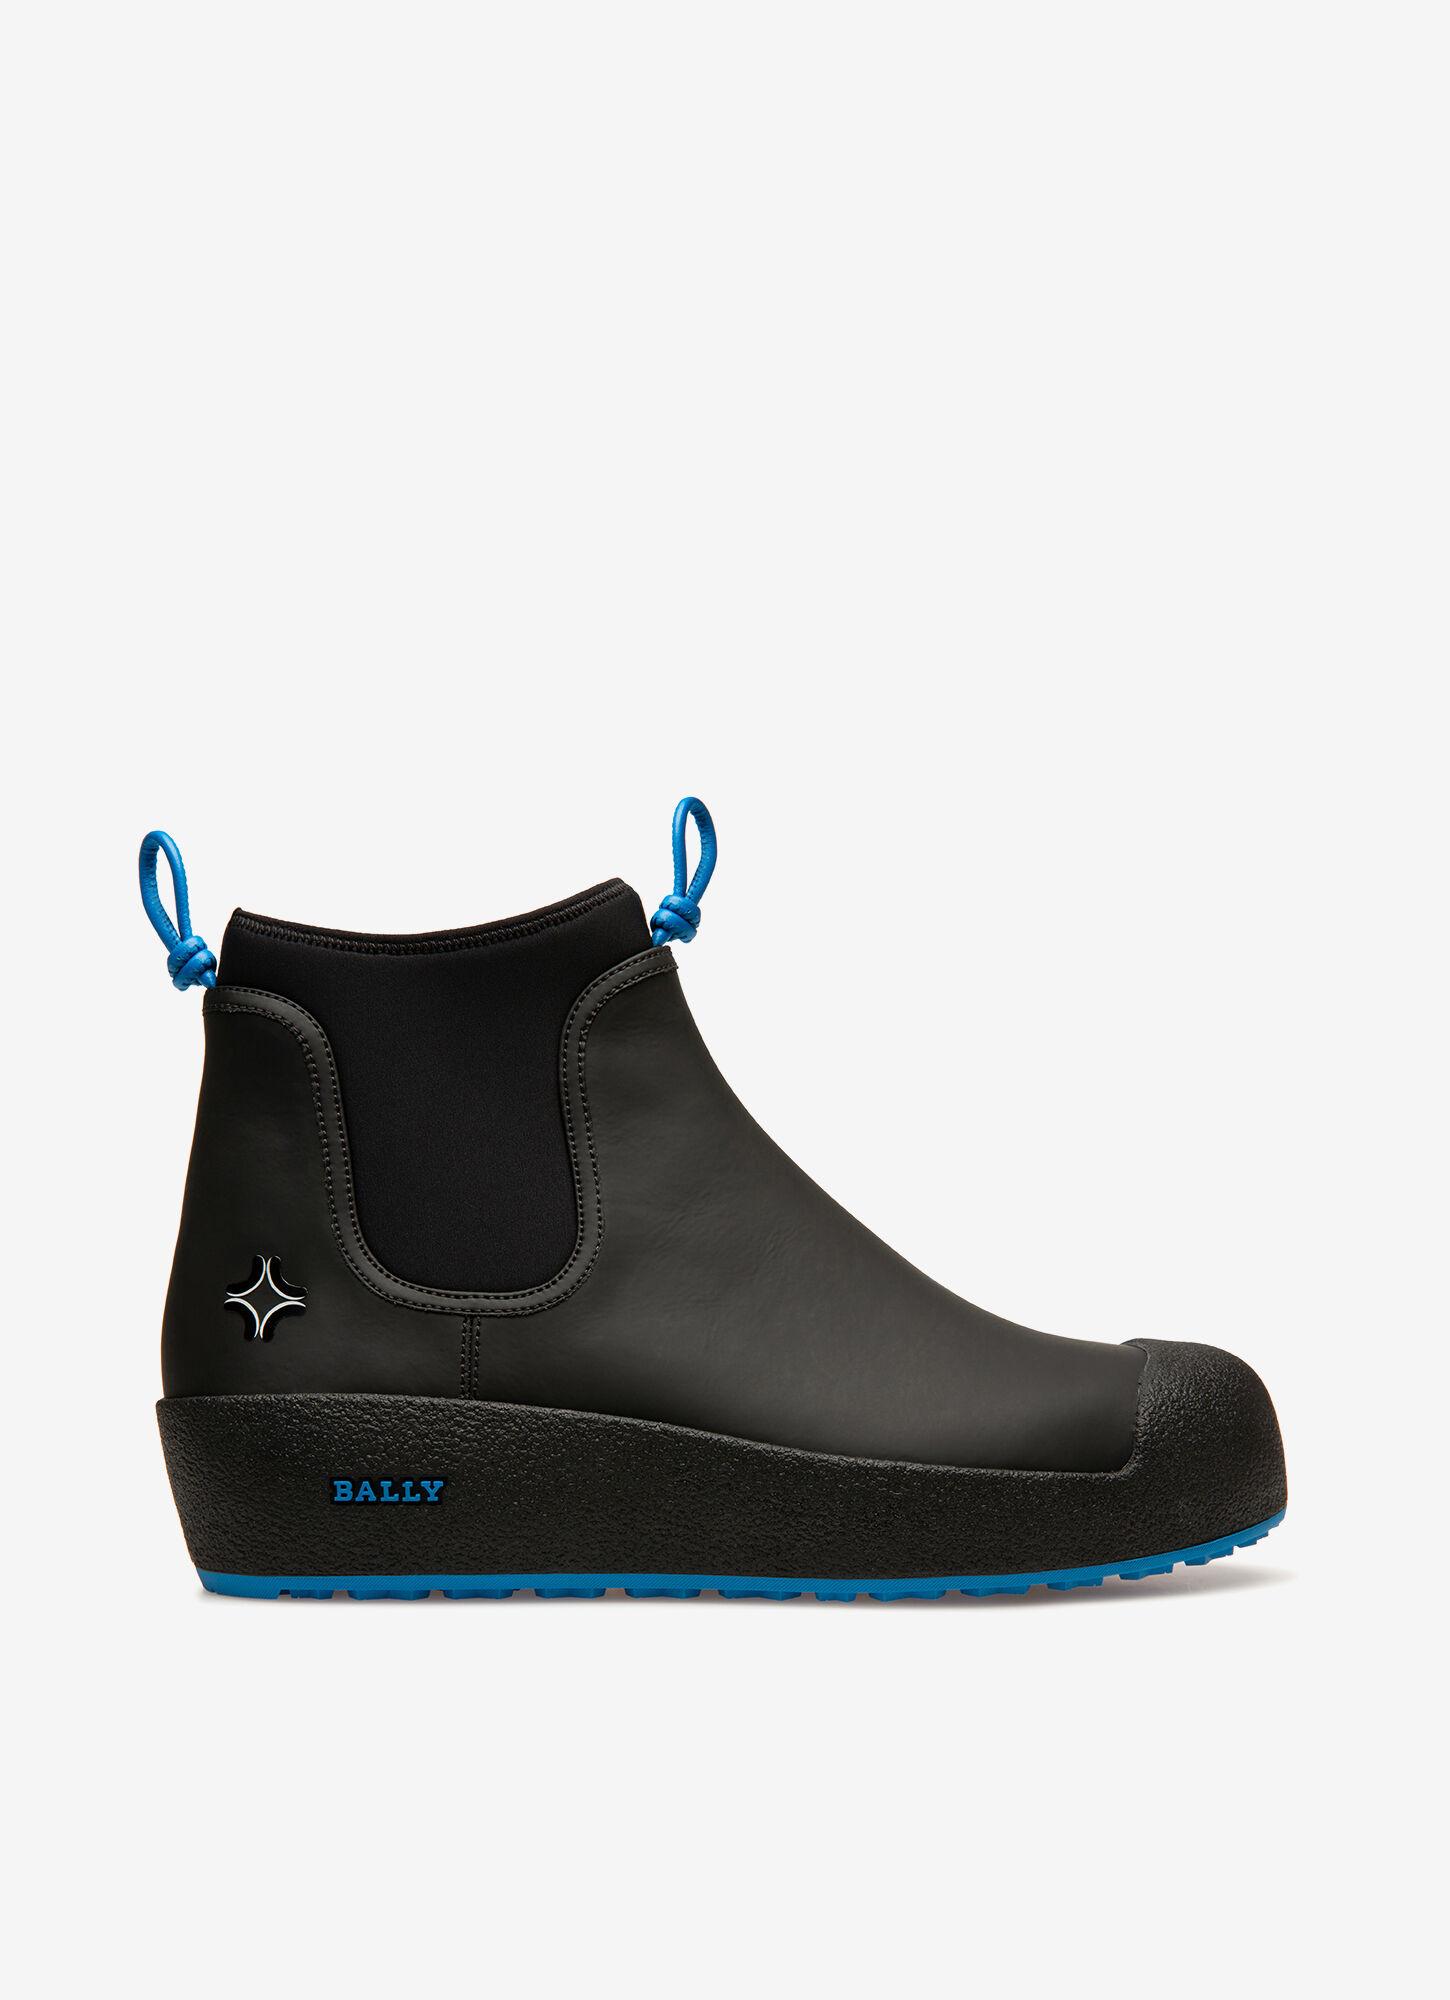 Men's Designer Shoes | Bally